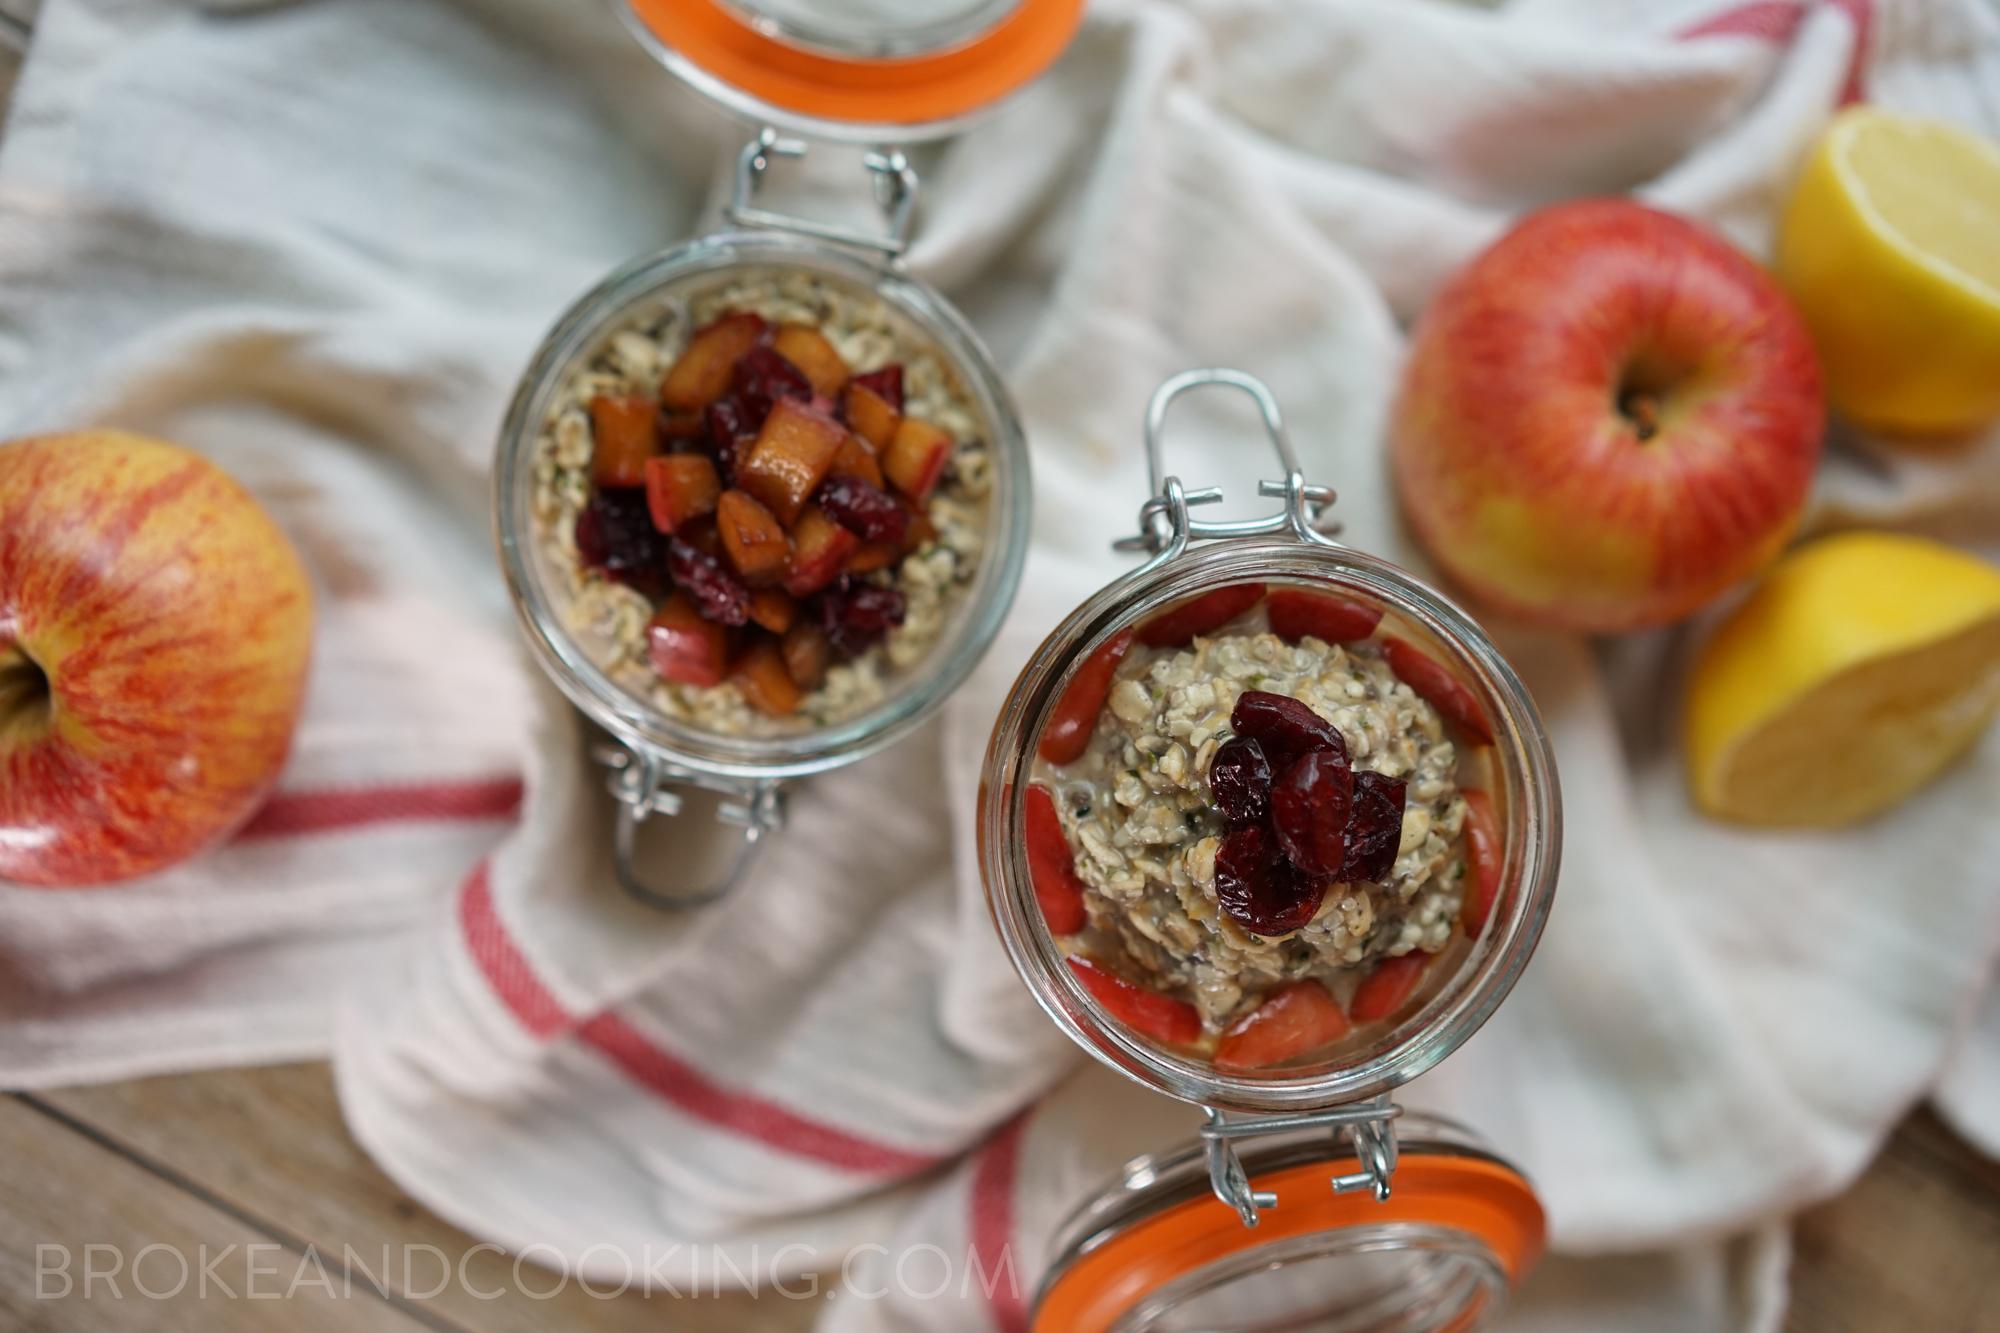 http://www.brokeandcooking.com/blog/apple-pie-overnight-hemp-oats